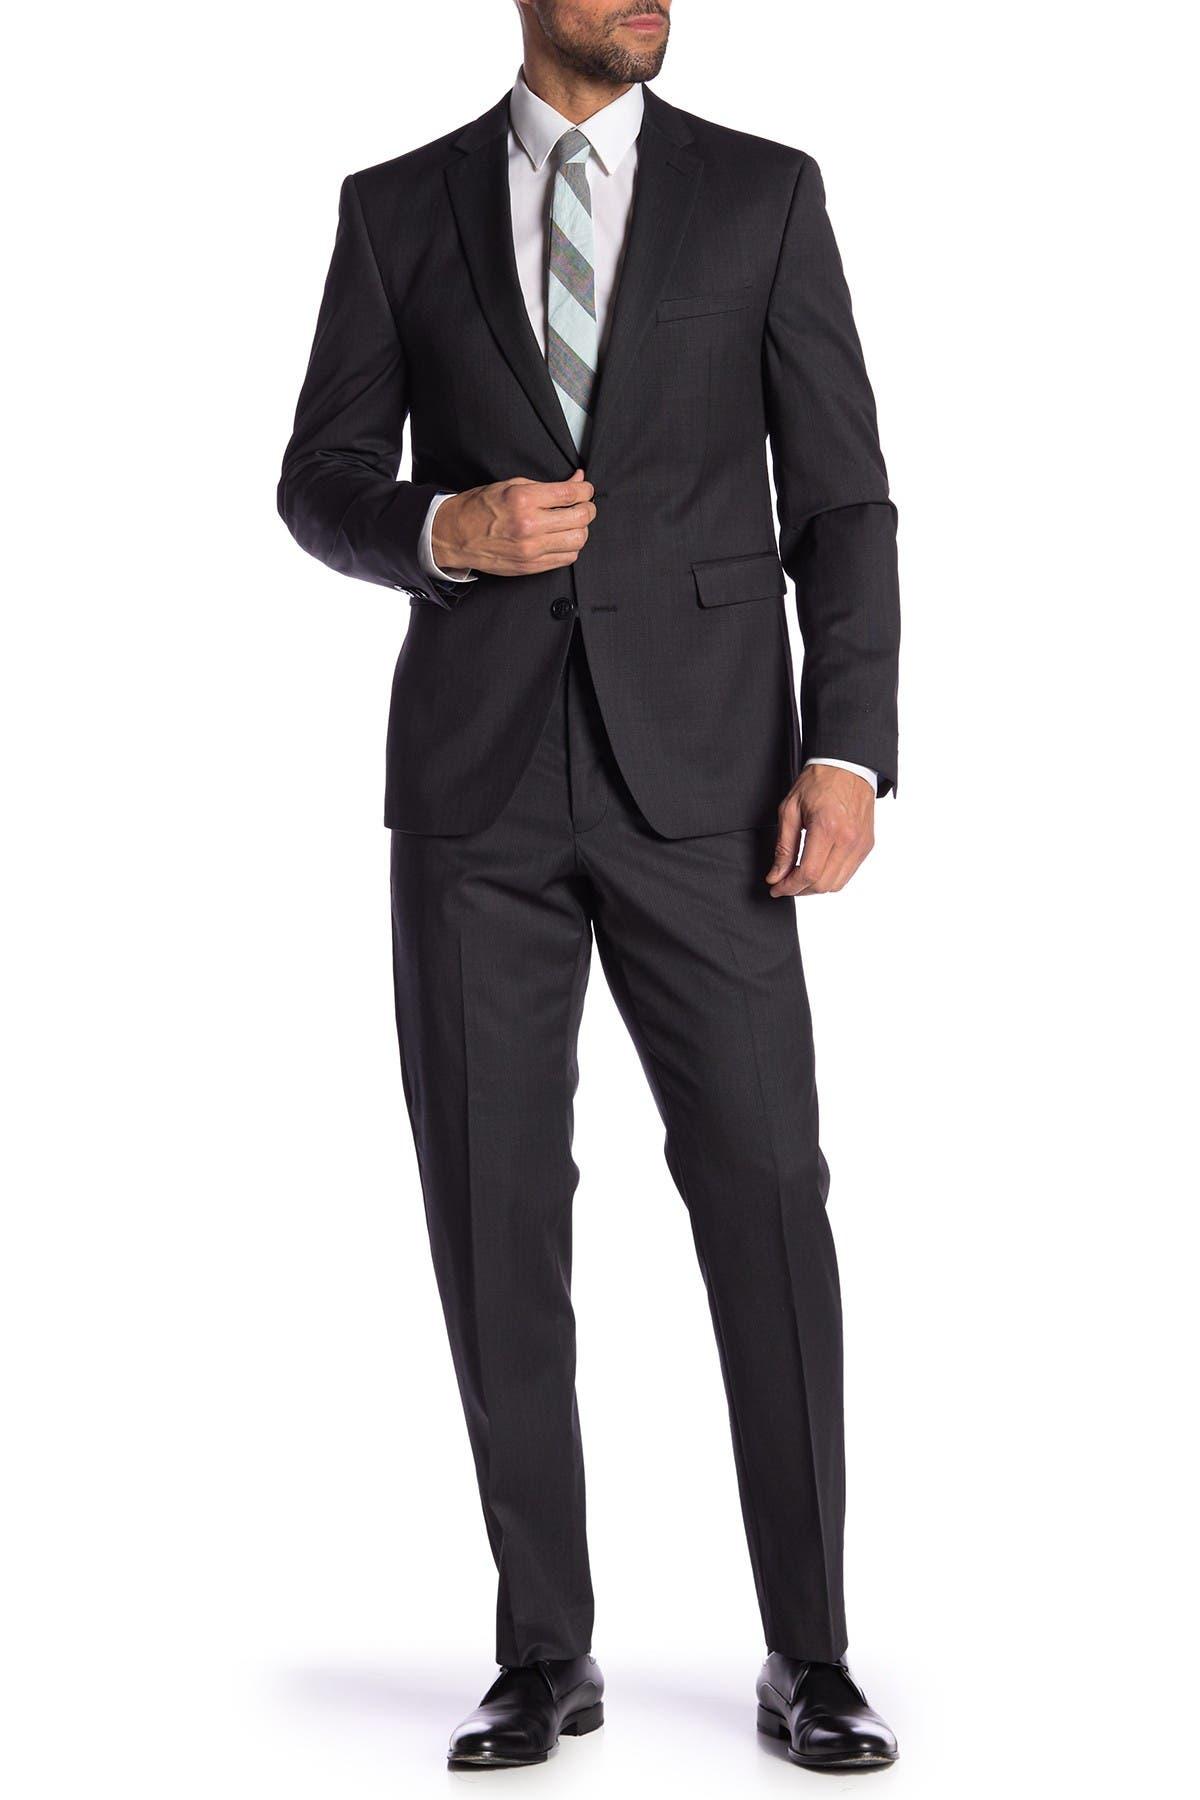 Vince Camuto Mens Slim Fit Peak Lapel Charcoal Tuxedo